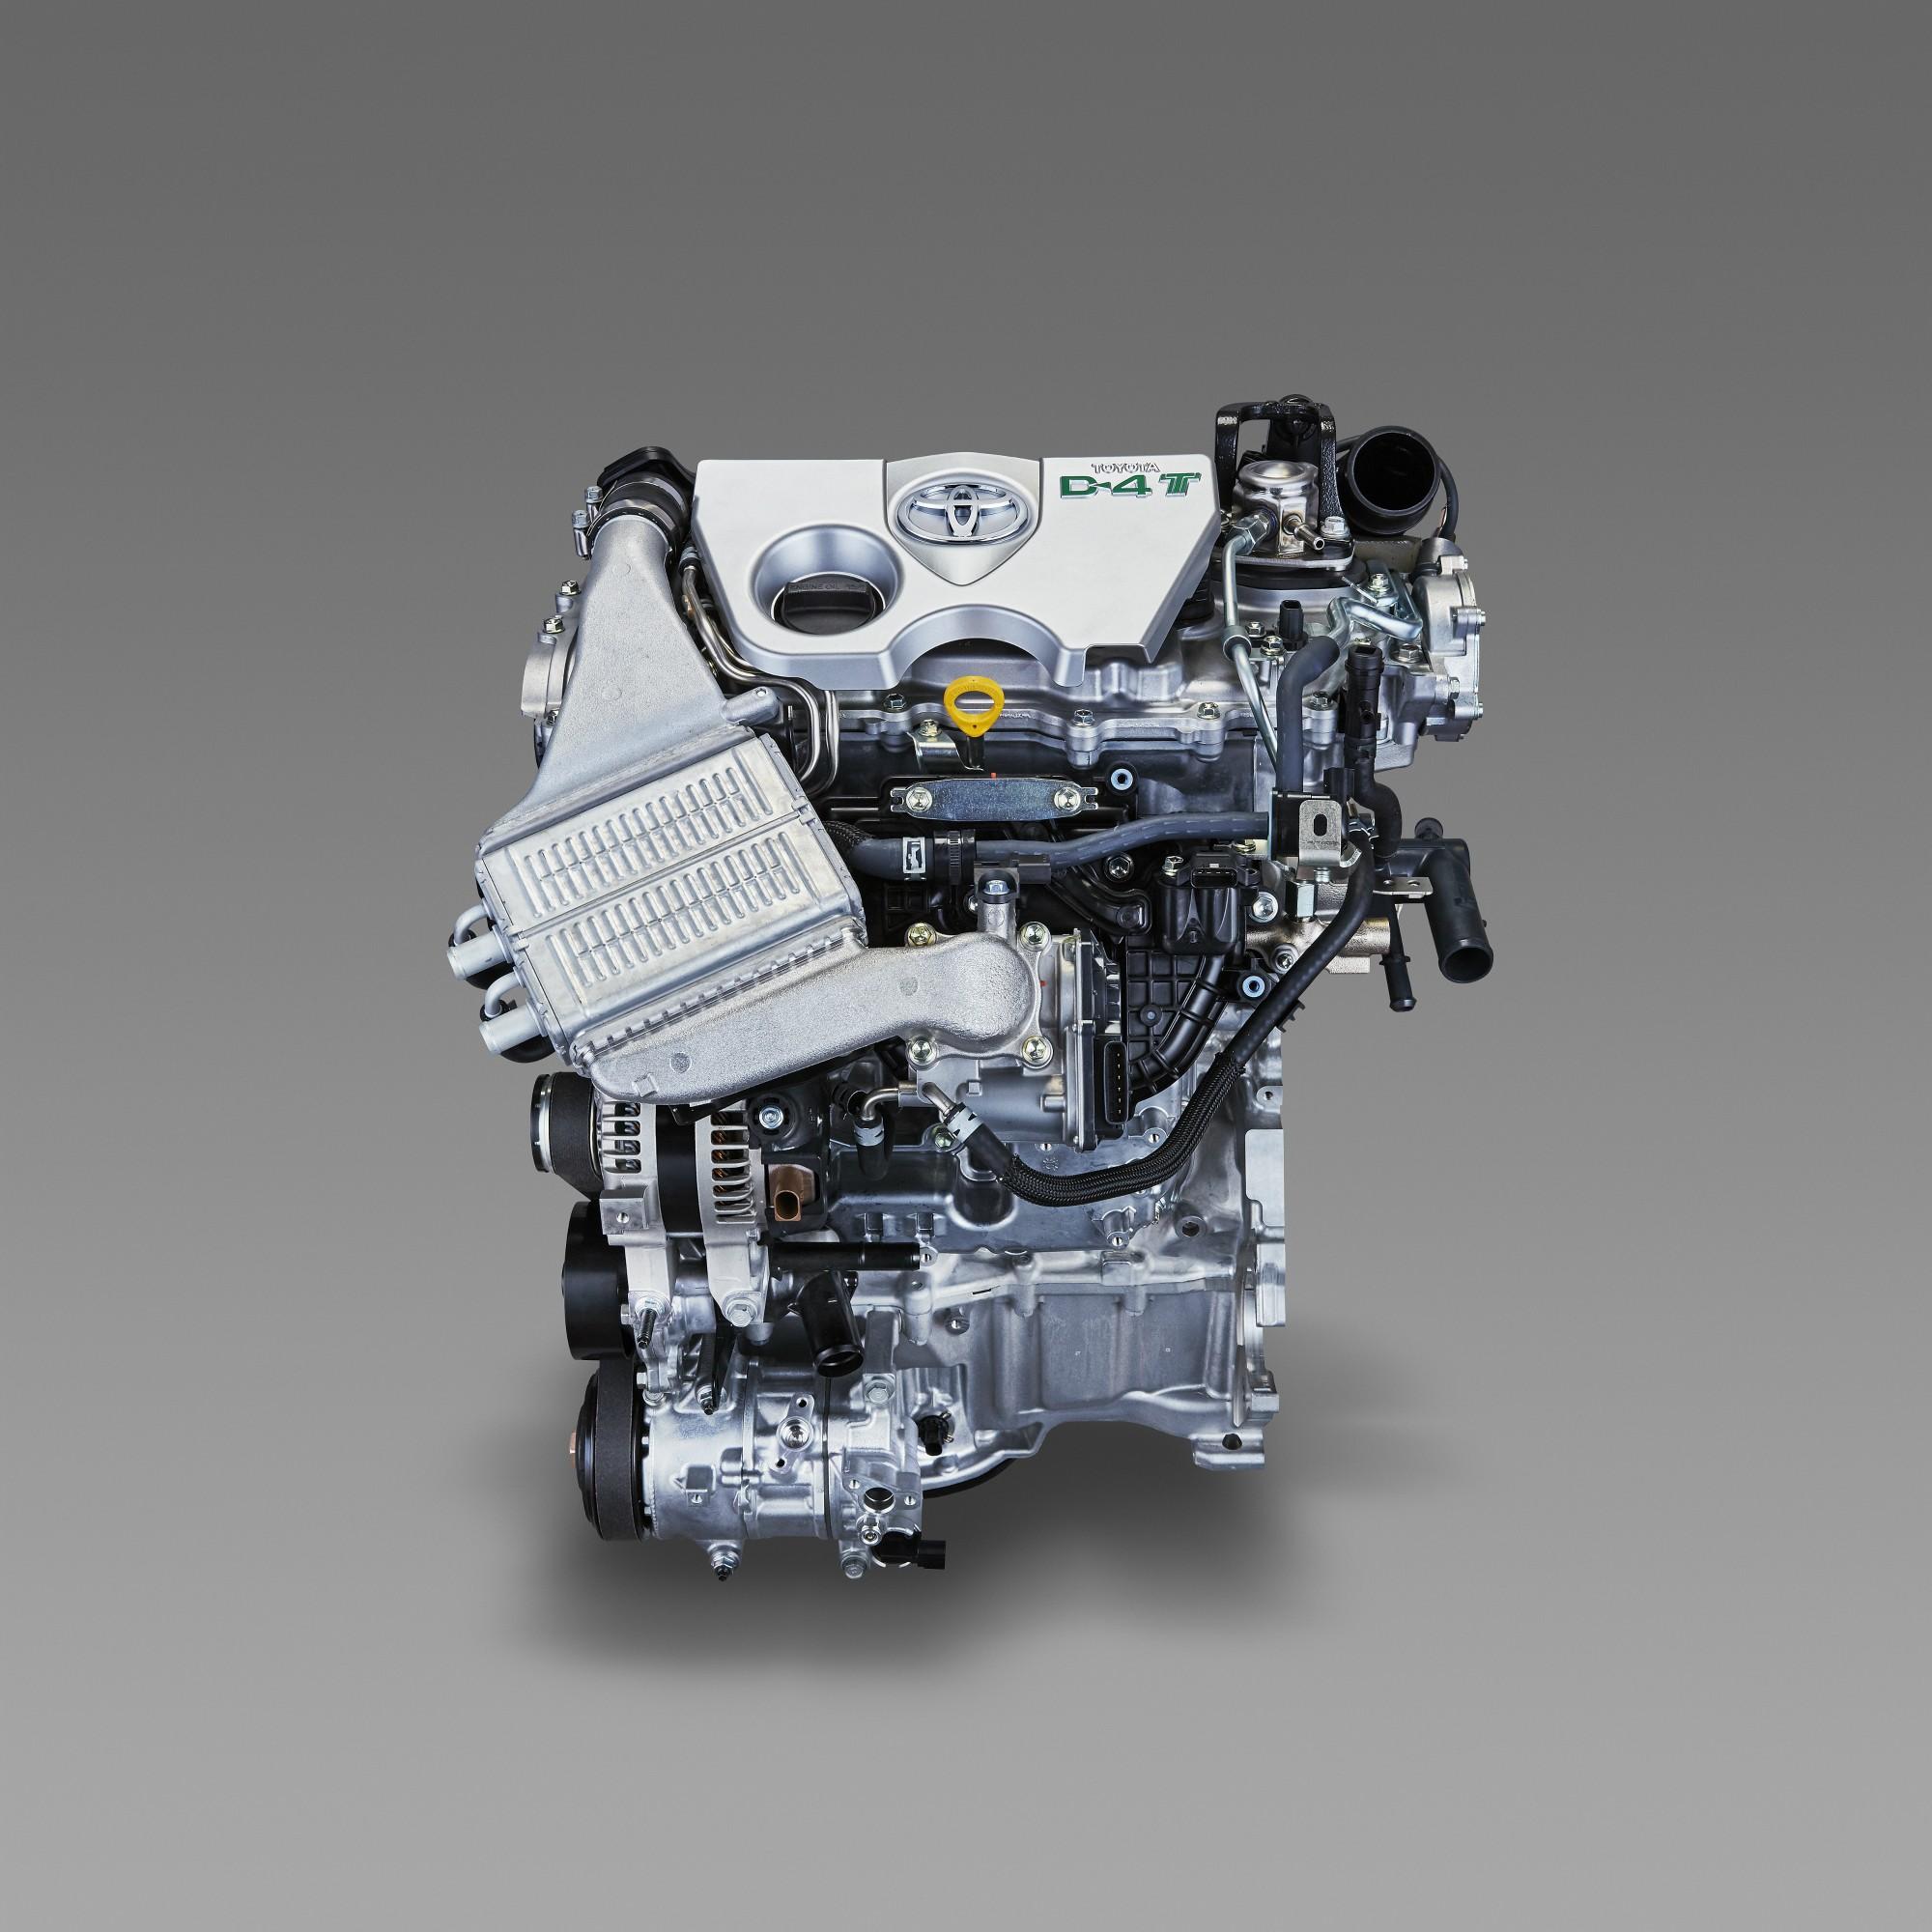 2015 Toyota Camry Hybrid Mpg Toyota 8NR-FTS 1.2L Turbo Engine Detailed - autoevolution